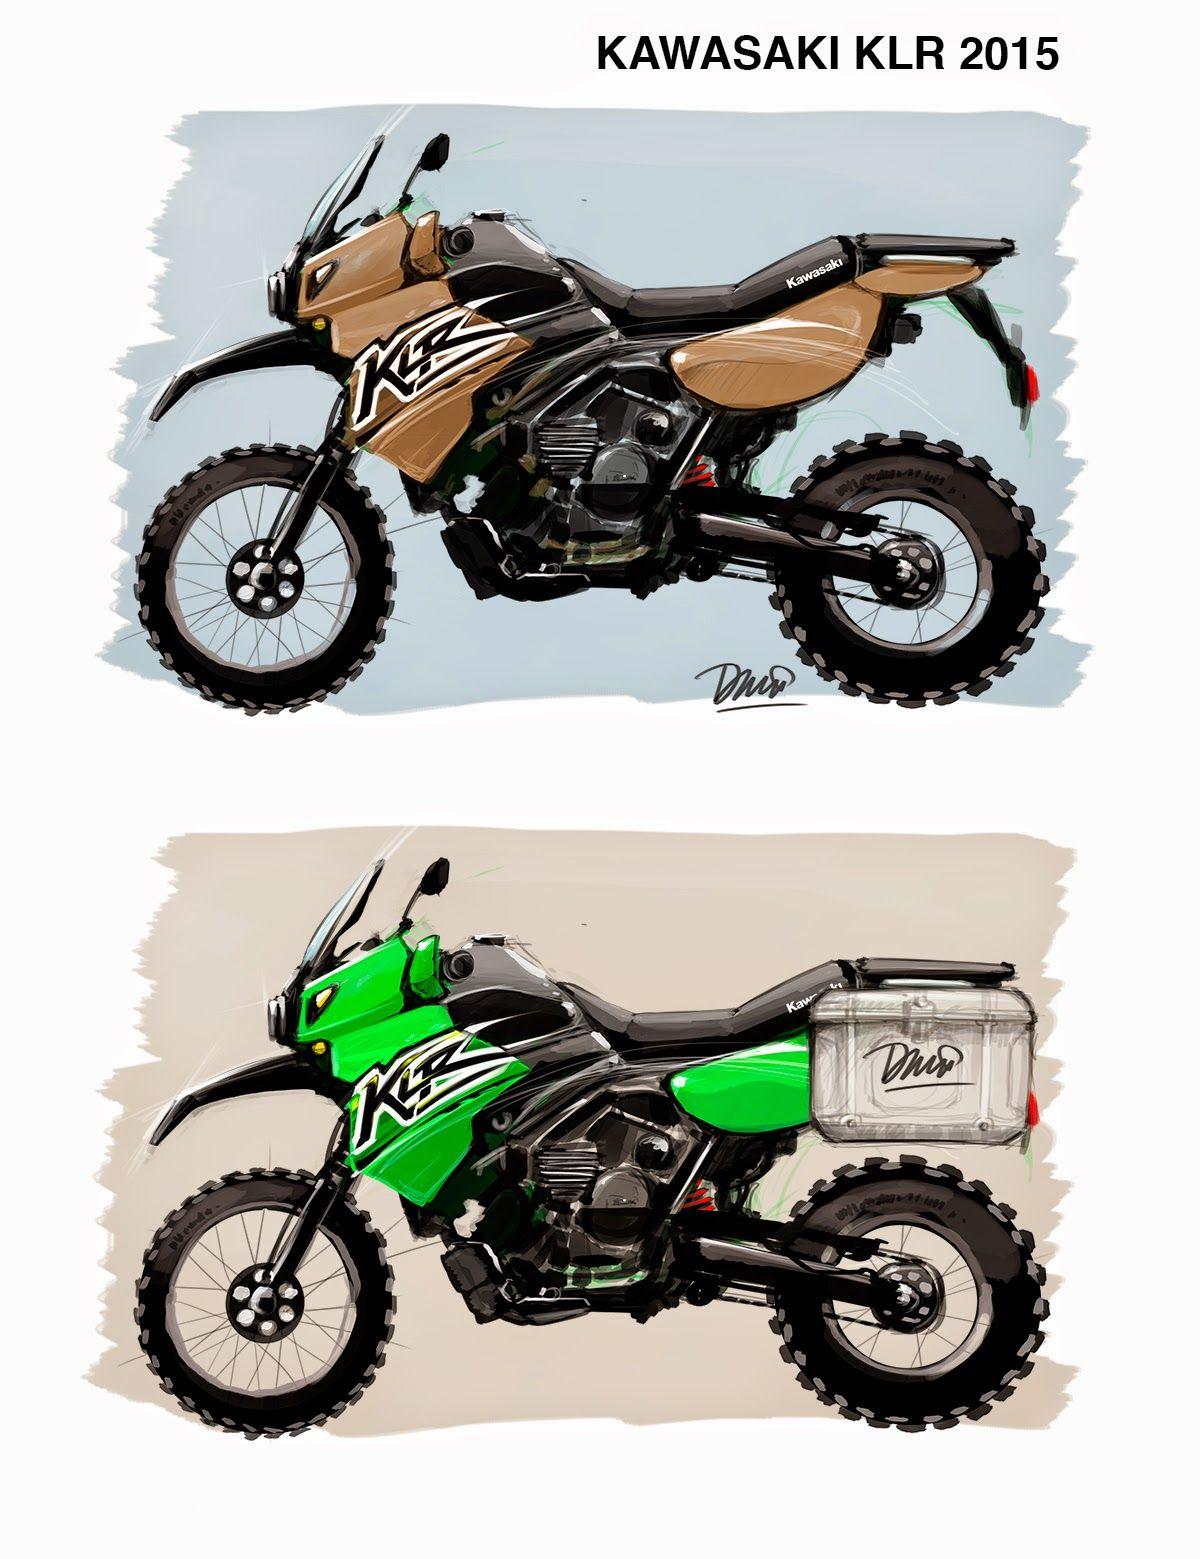 Kawasaki Klr 650 Sketch Klr 650 Bike Sketch Trail Motorcycle